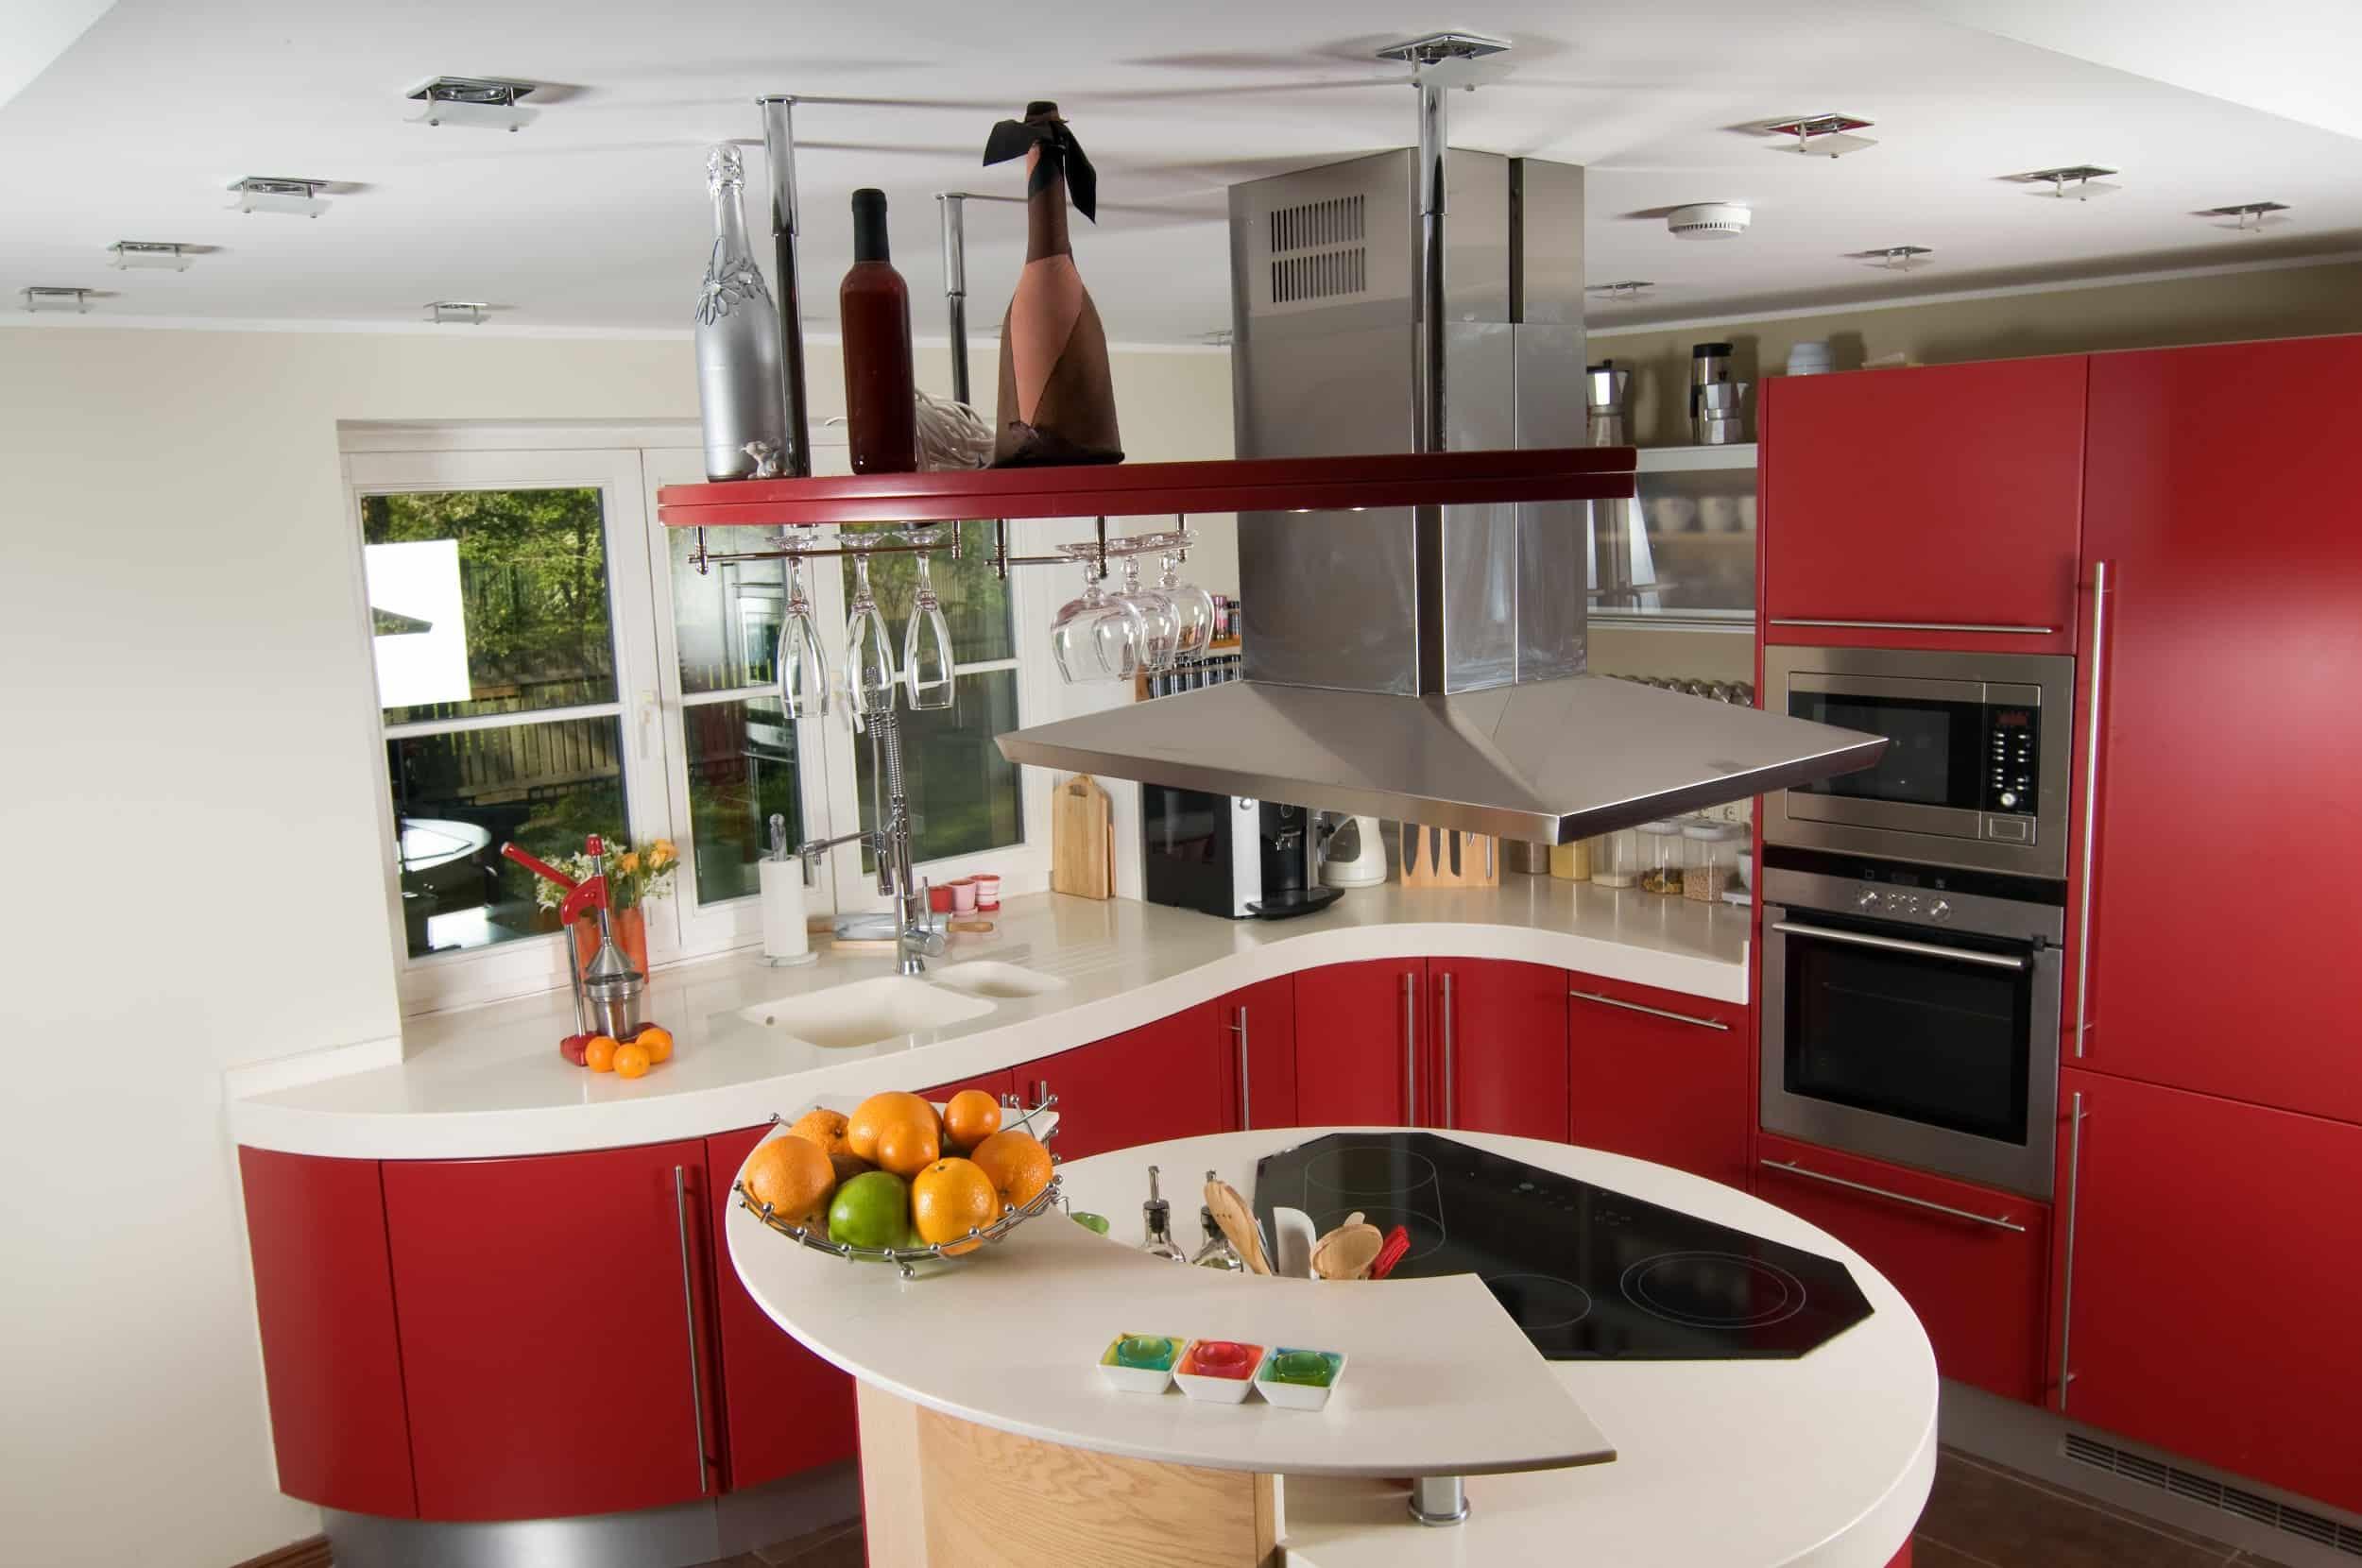 Kitchen Circular Island Article Image